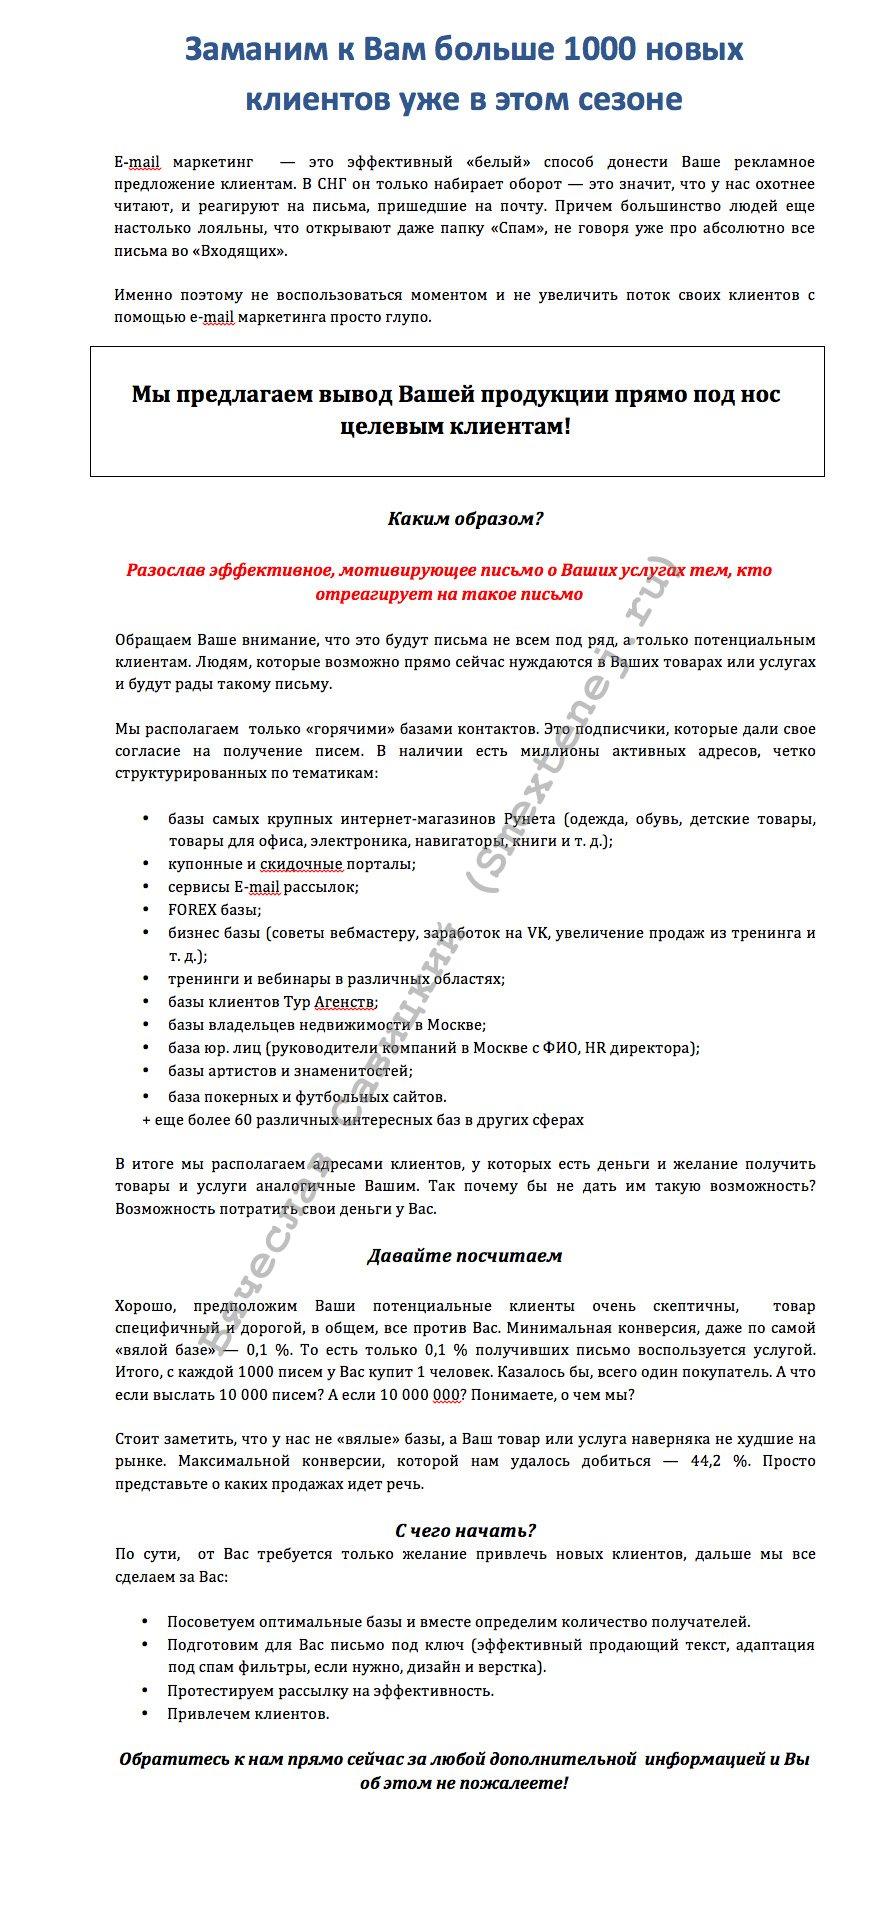 Коммерческое предложение (КП): e-mail маркетинг